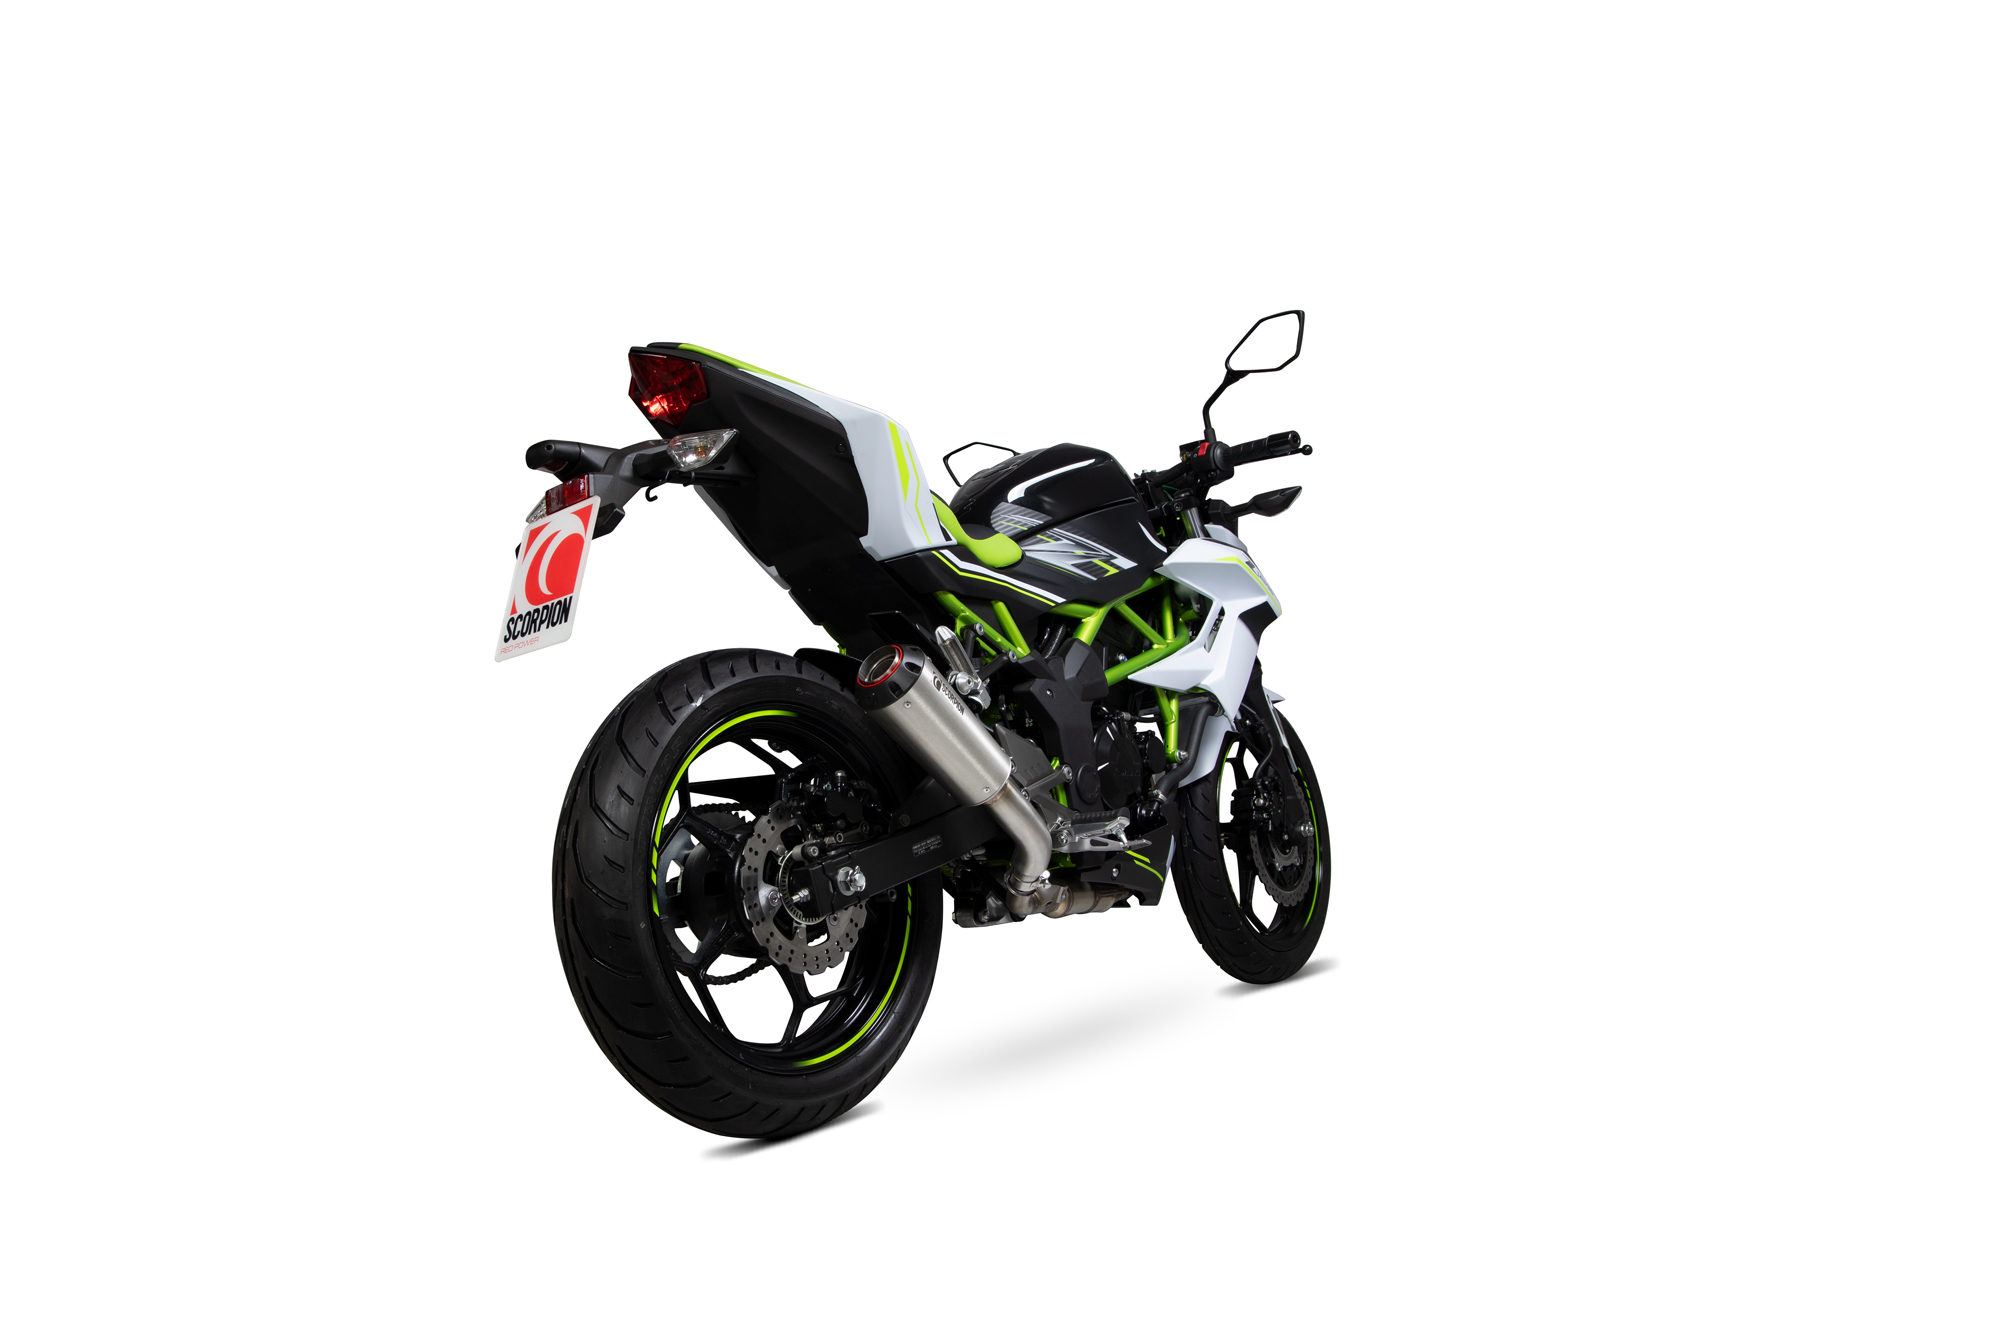 Scorpion Red Power Slip-On Exhaust - Kawasaki Z125 (2018 - Current)